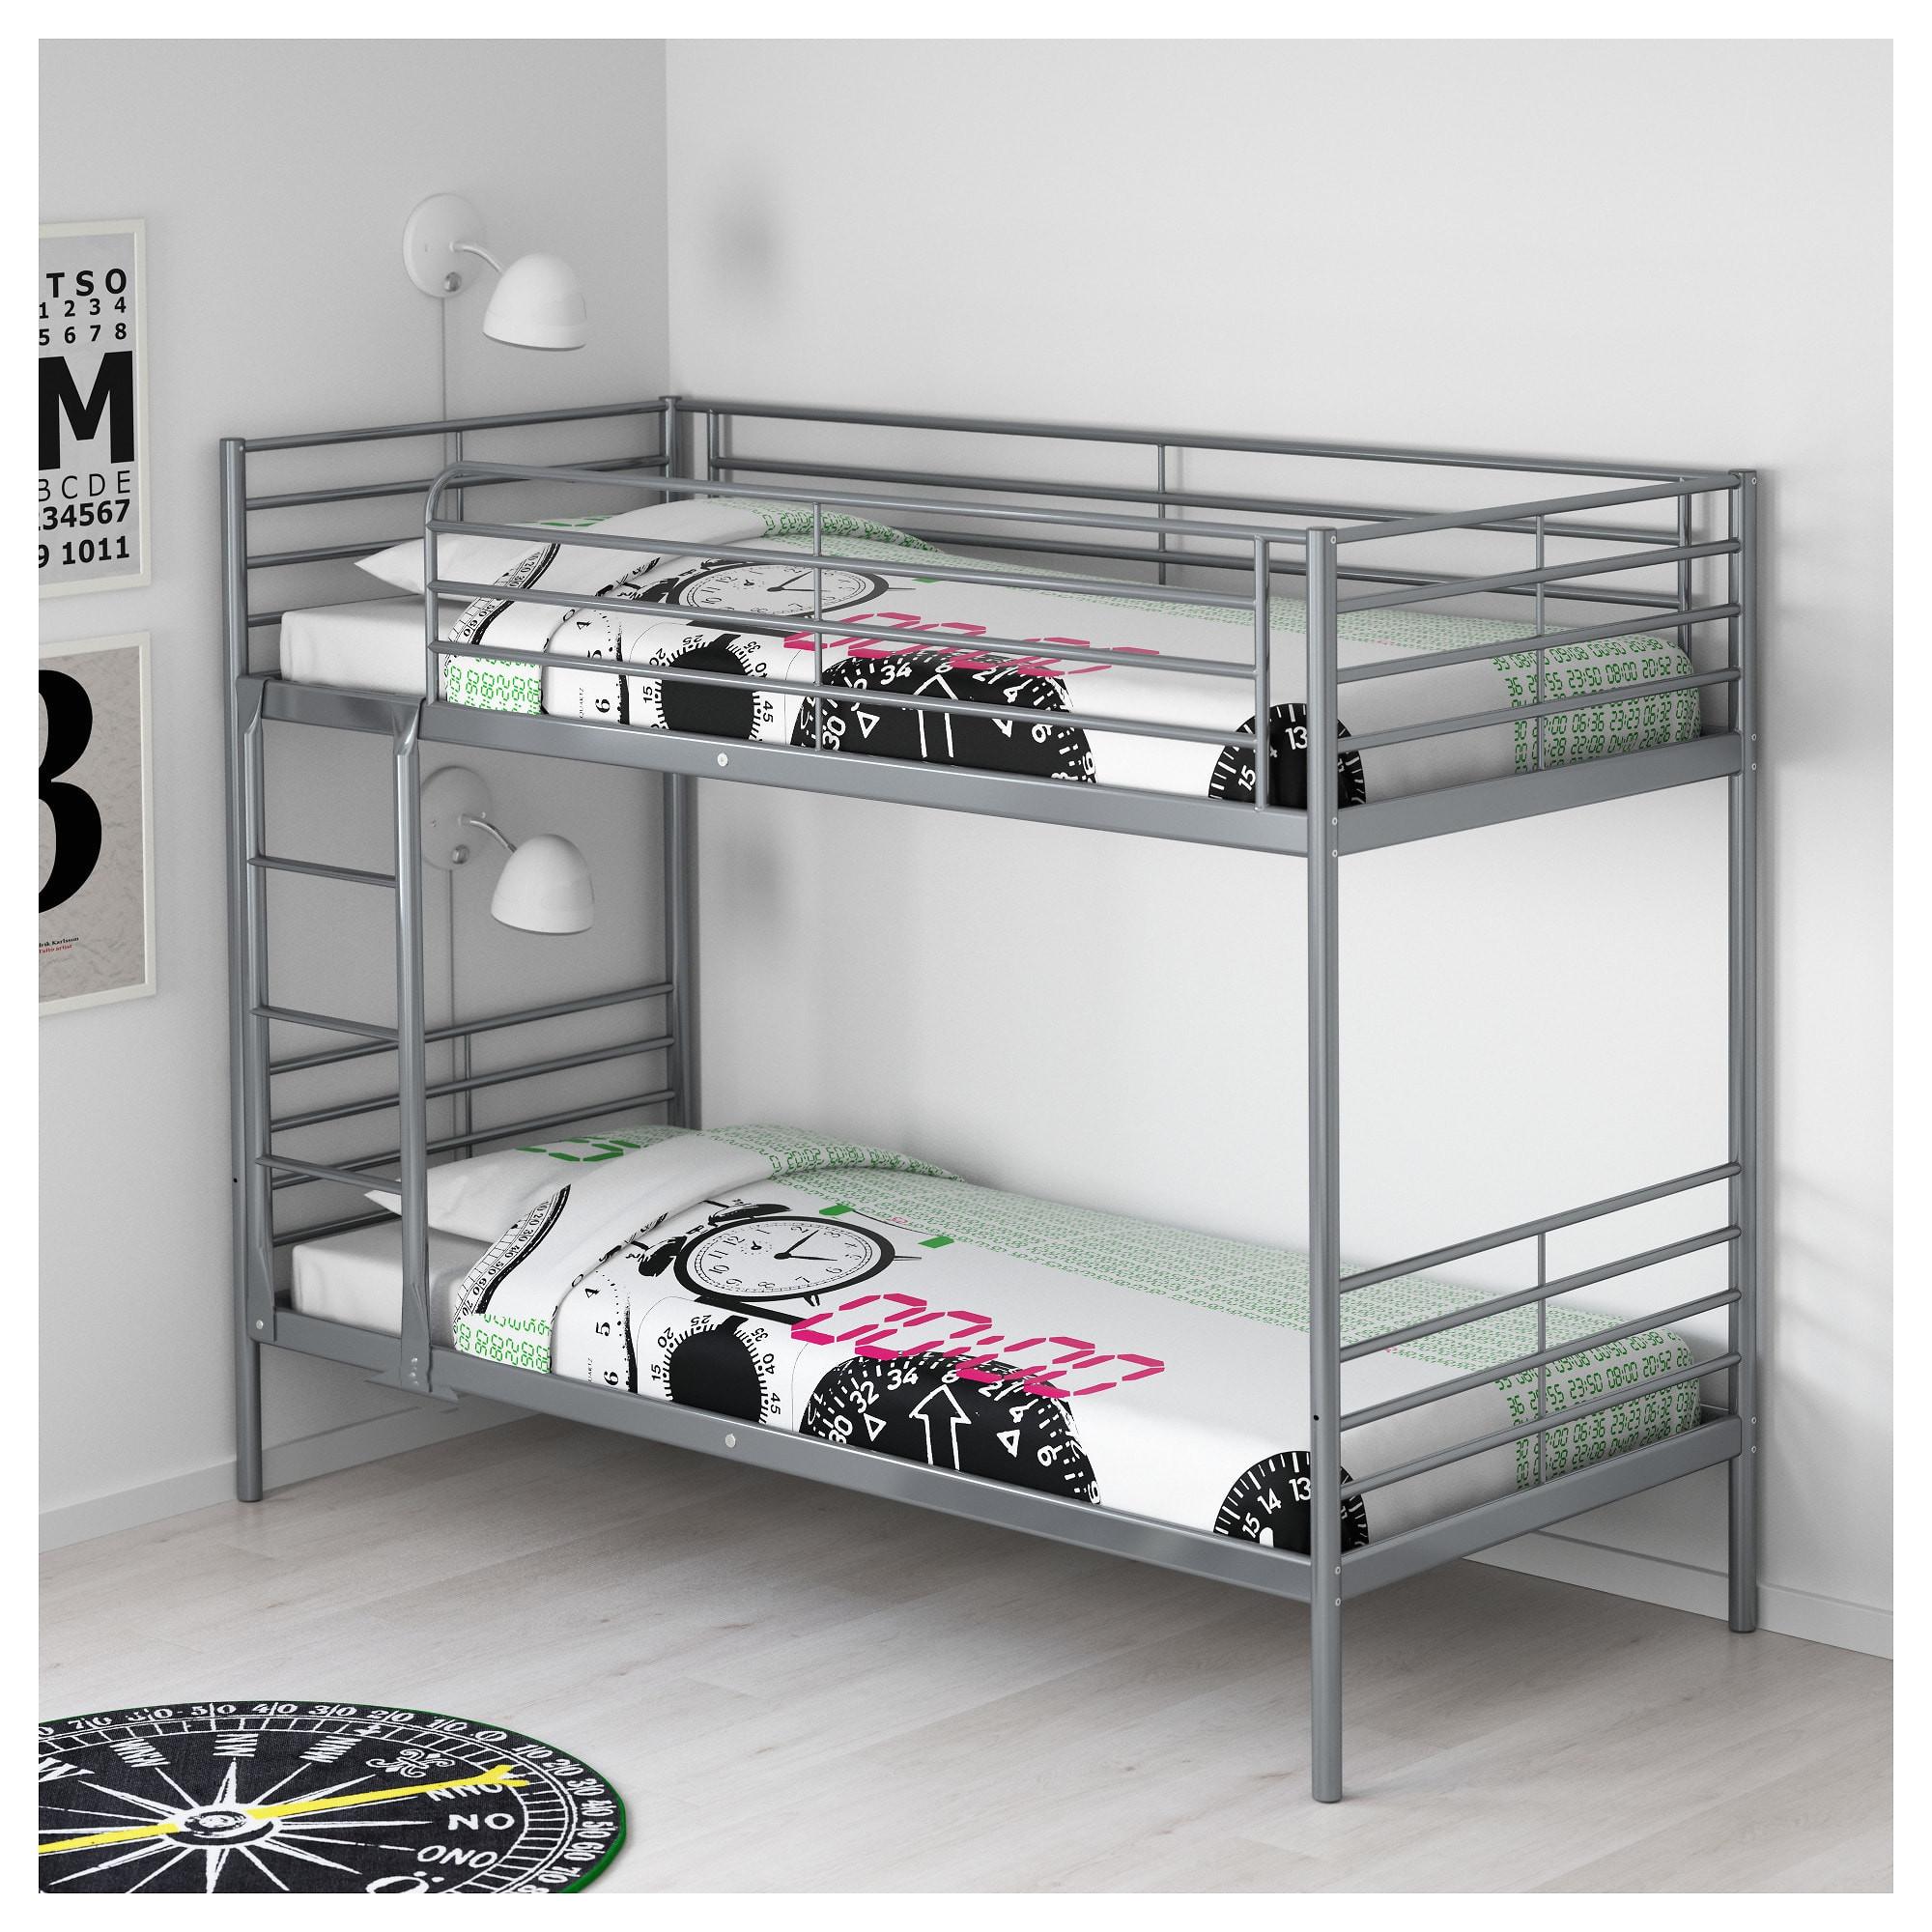 Loft Bed Assembly Instructions Pdf Adinaporter